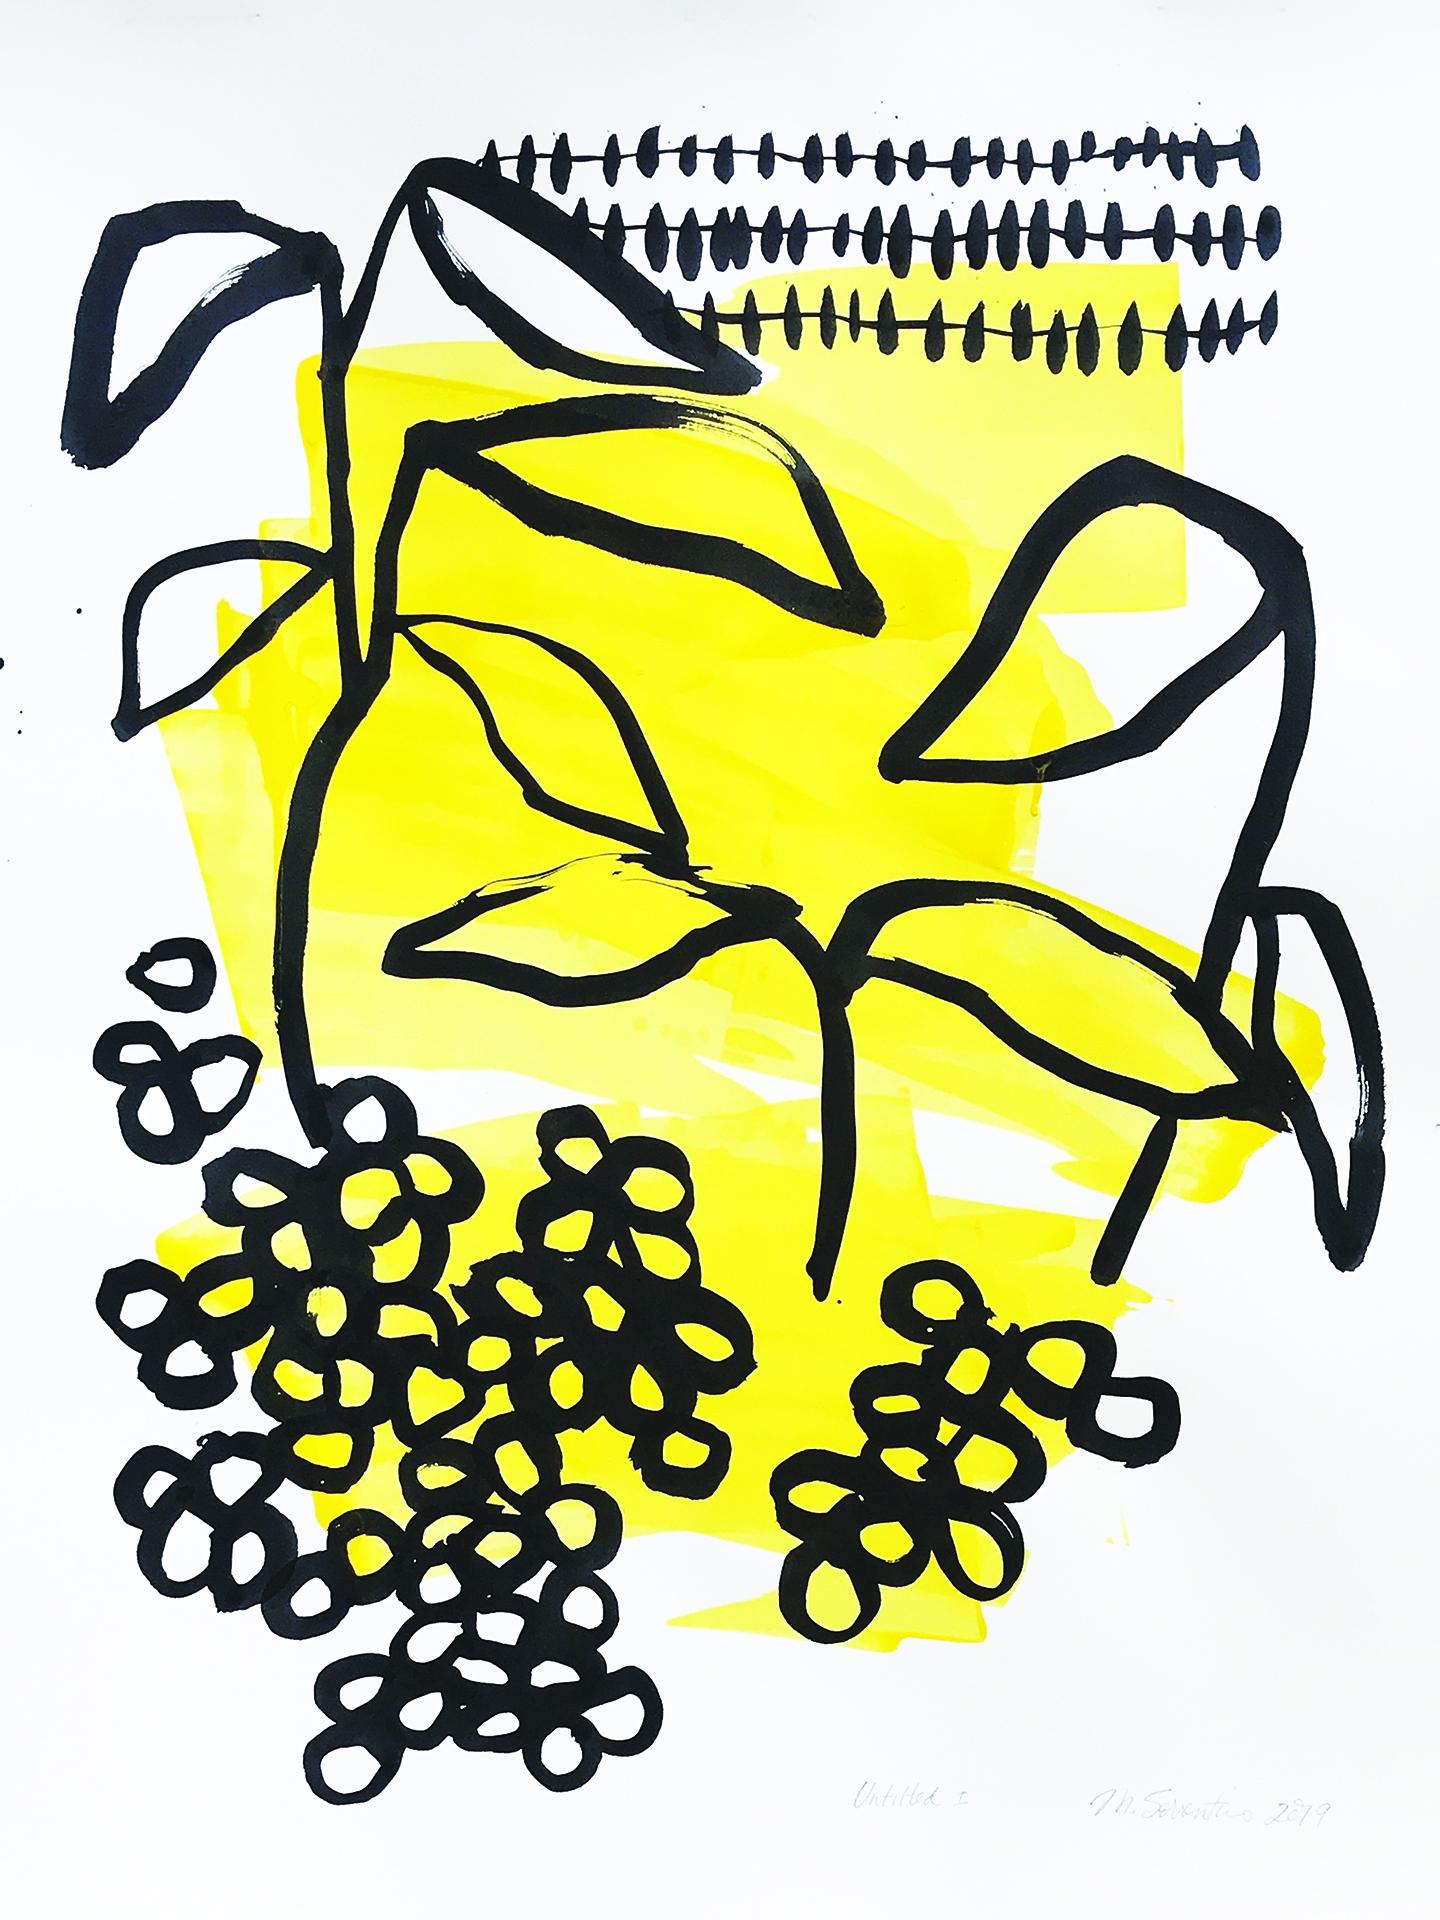 Untitled I by Michela Sorrentino